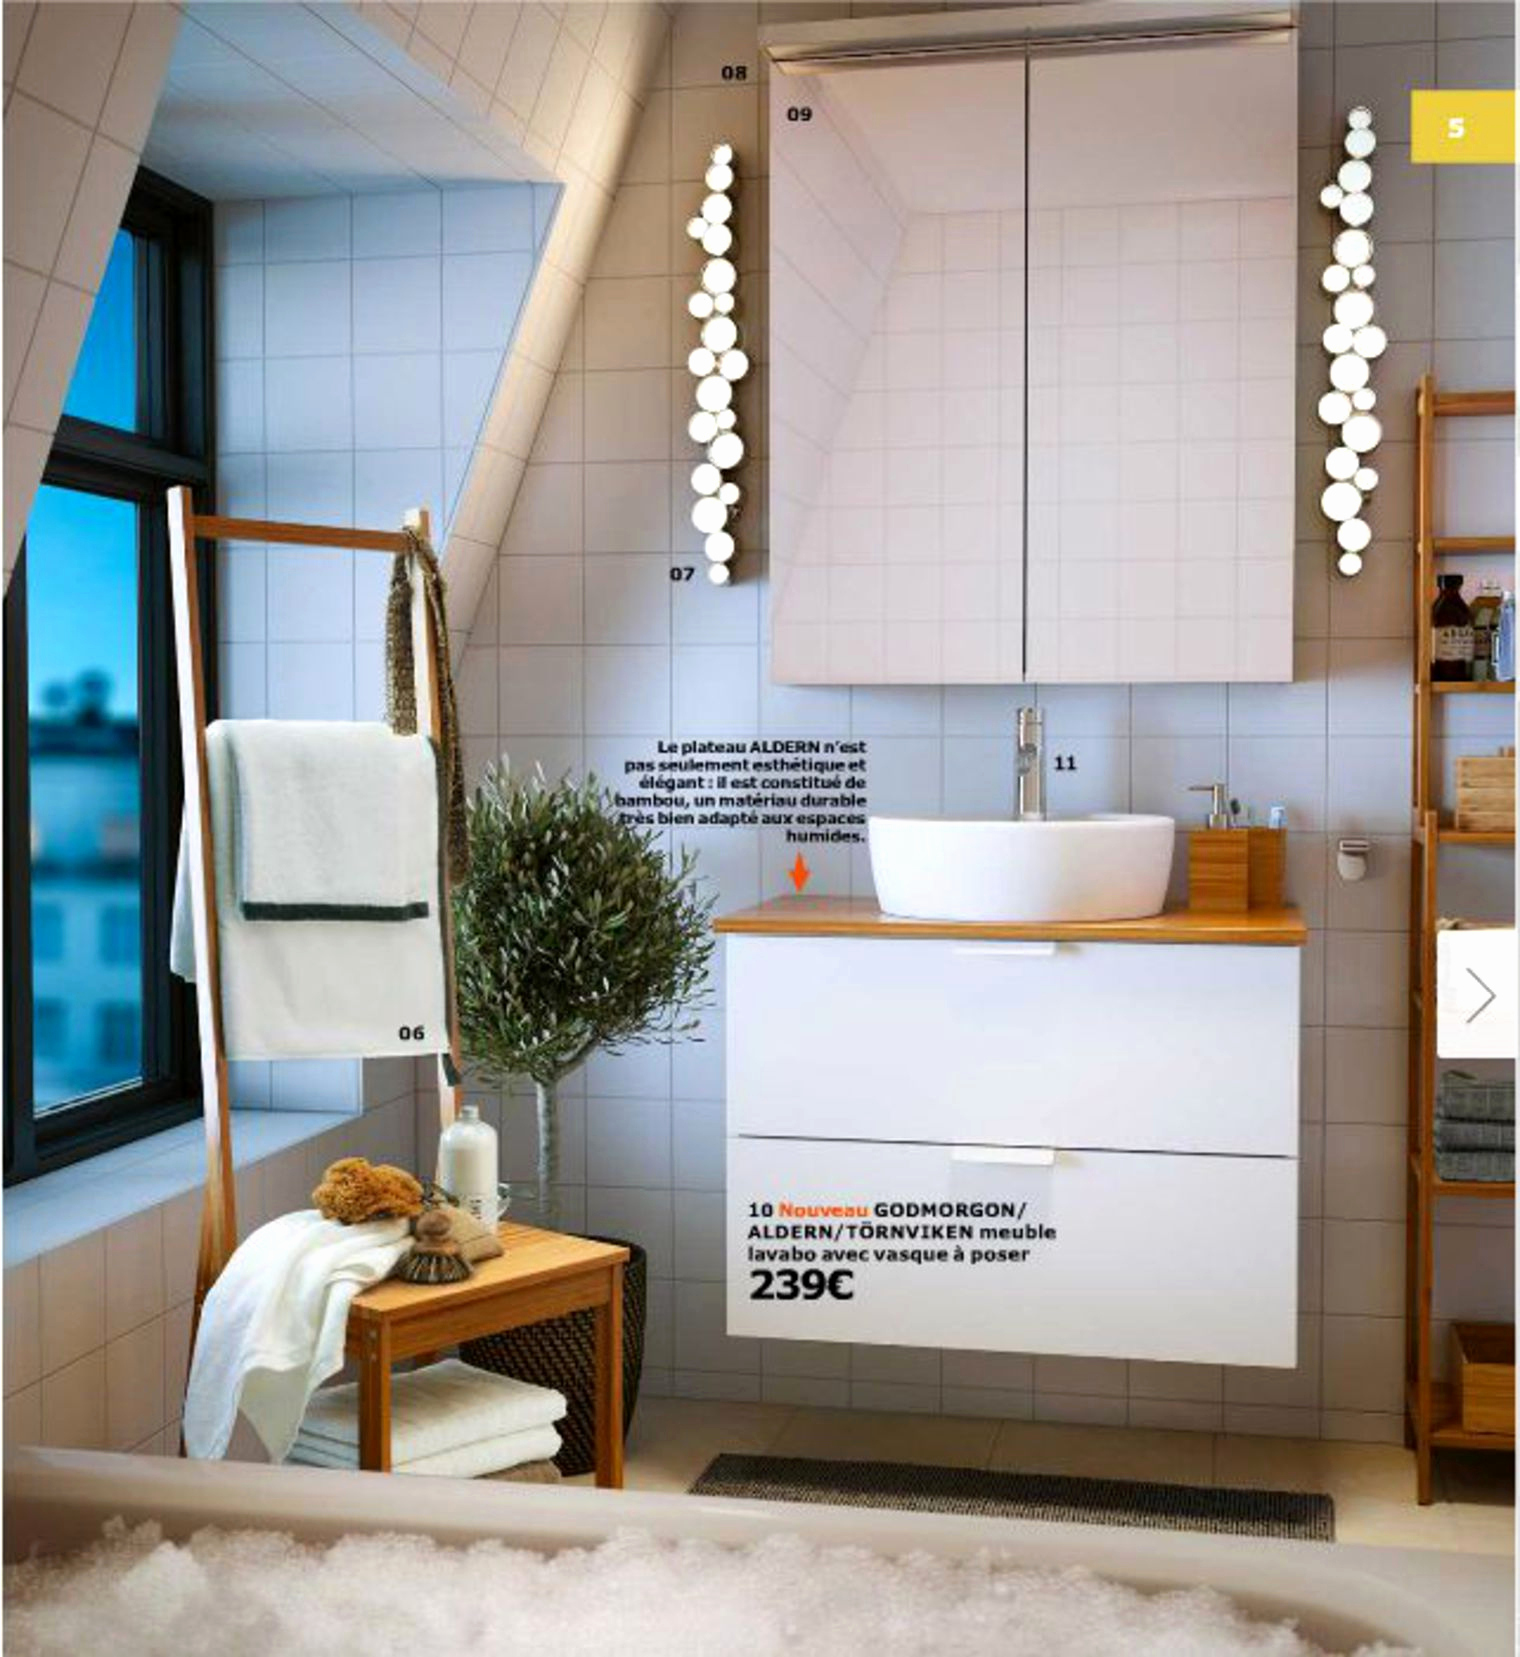 Meuble Lavabo Salle De Bain Ikea Nouveau Photos Revetement Mural Cuisine Ikea Inspirant Revetement Mural Ikea